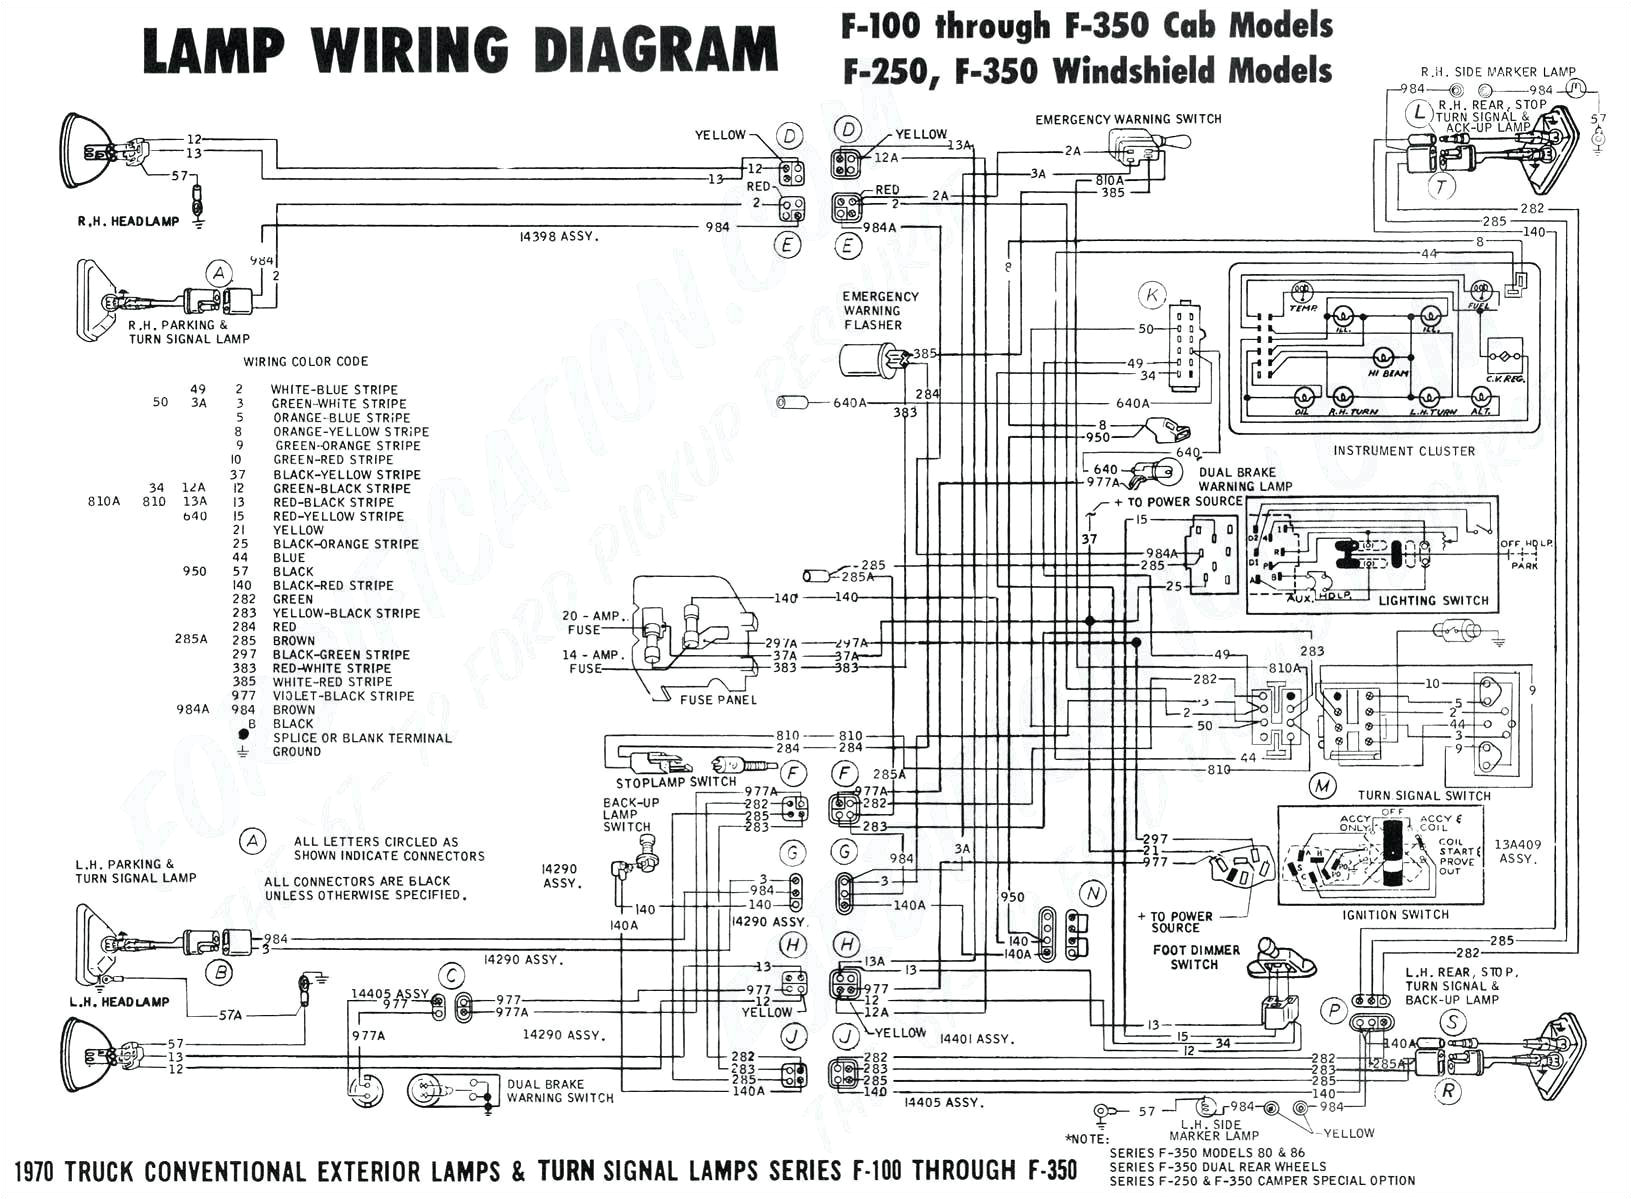 ford f 650 wiring diagram wiring diagram effikal model gvd wiring diagram